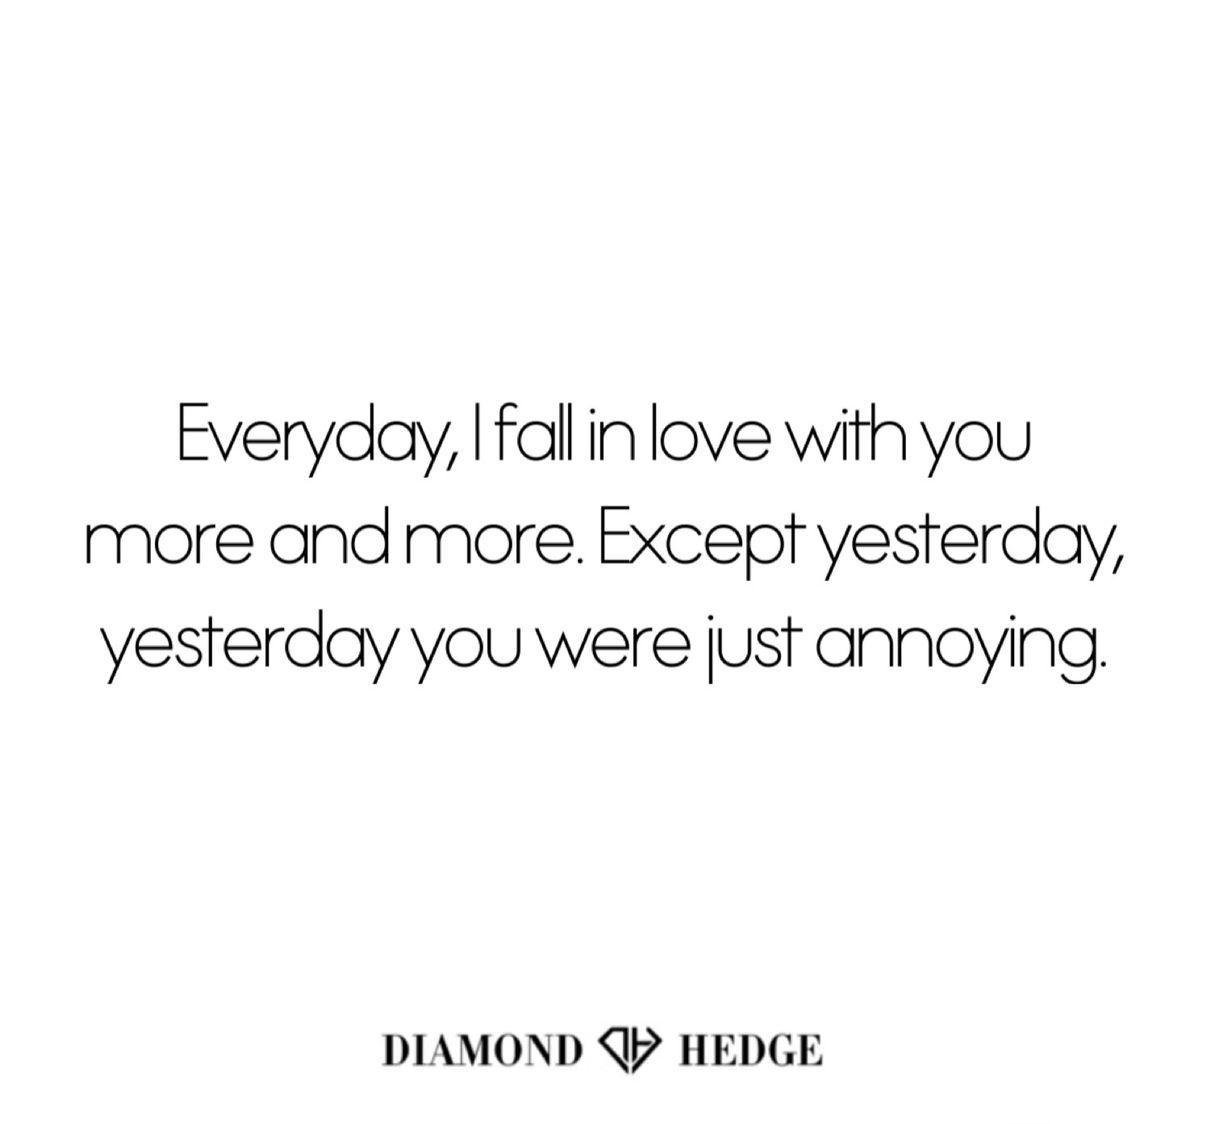 Who can relate? 😂       DiamondHedge.com